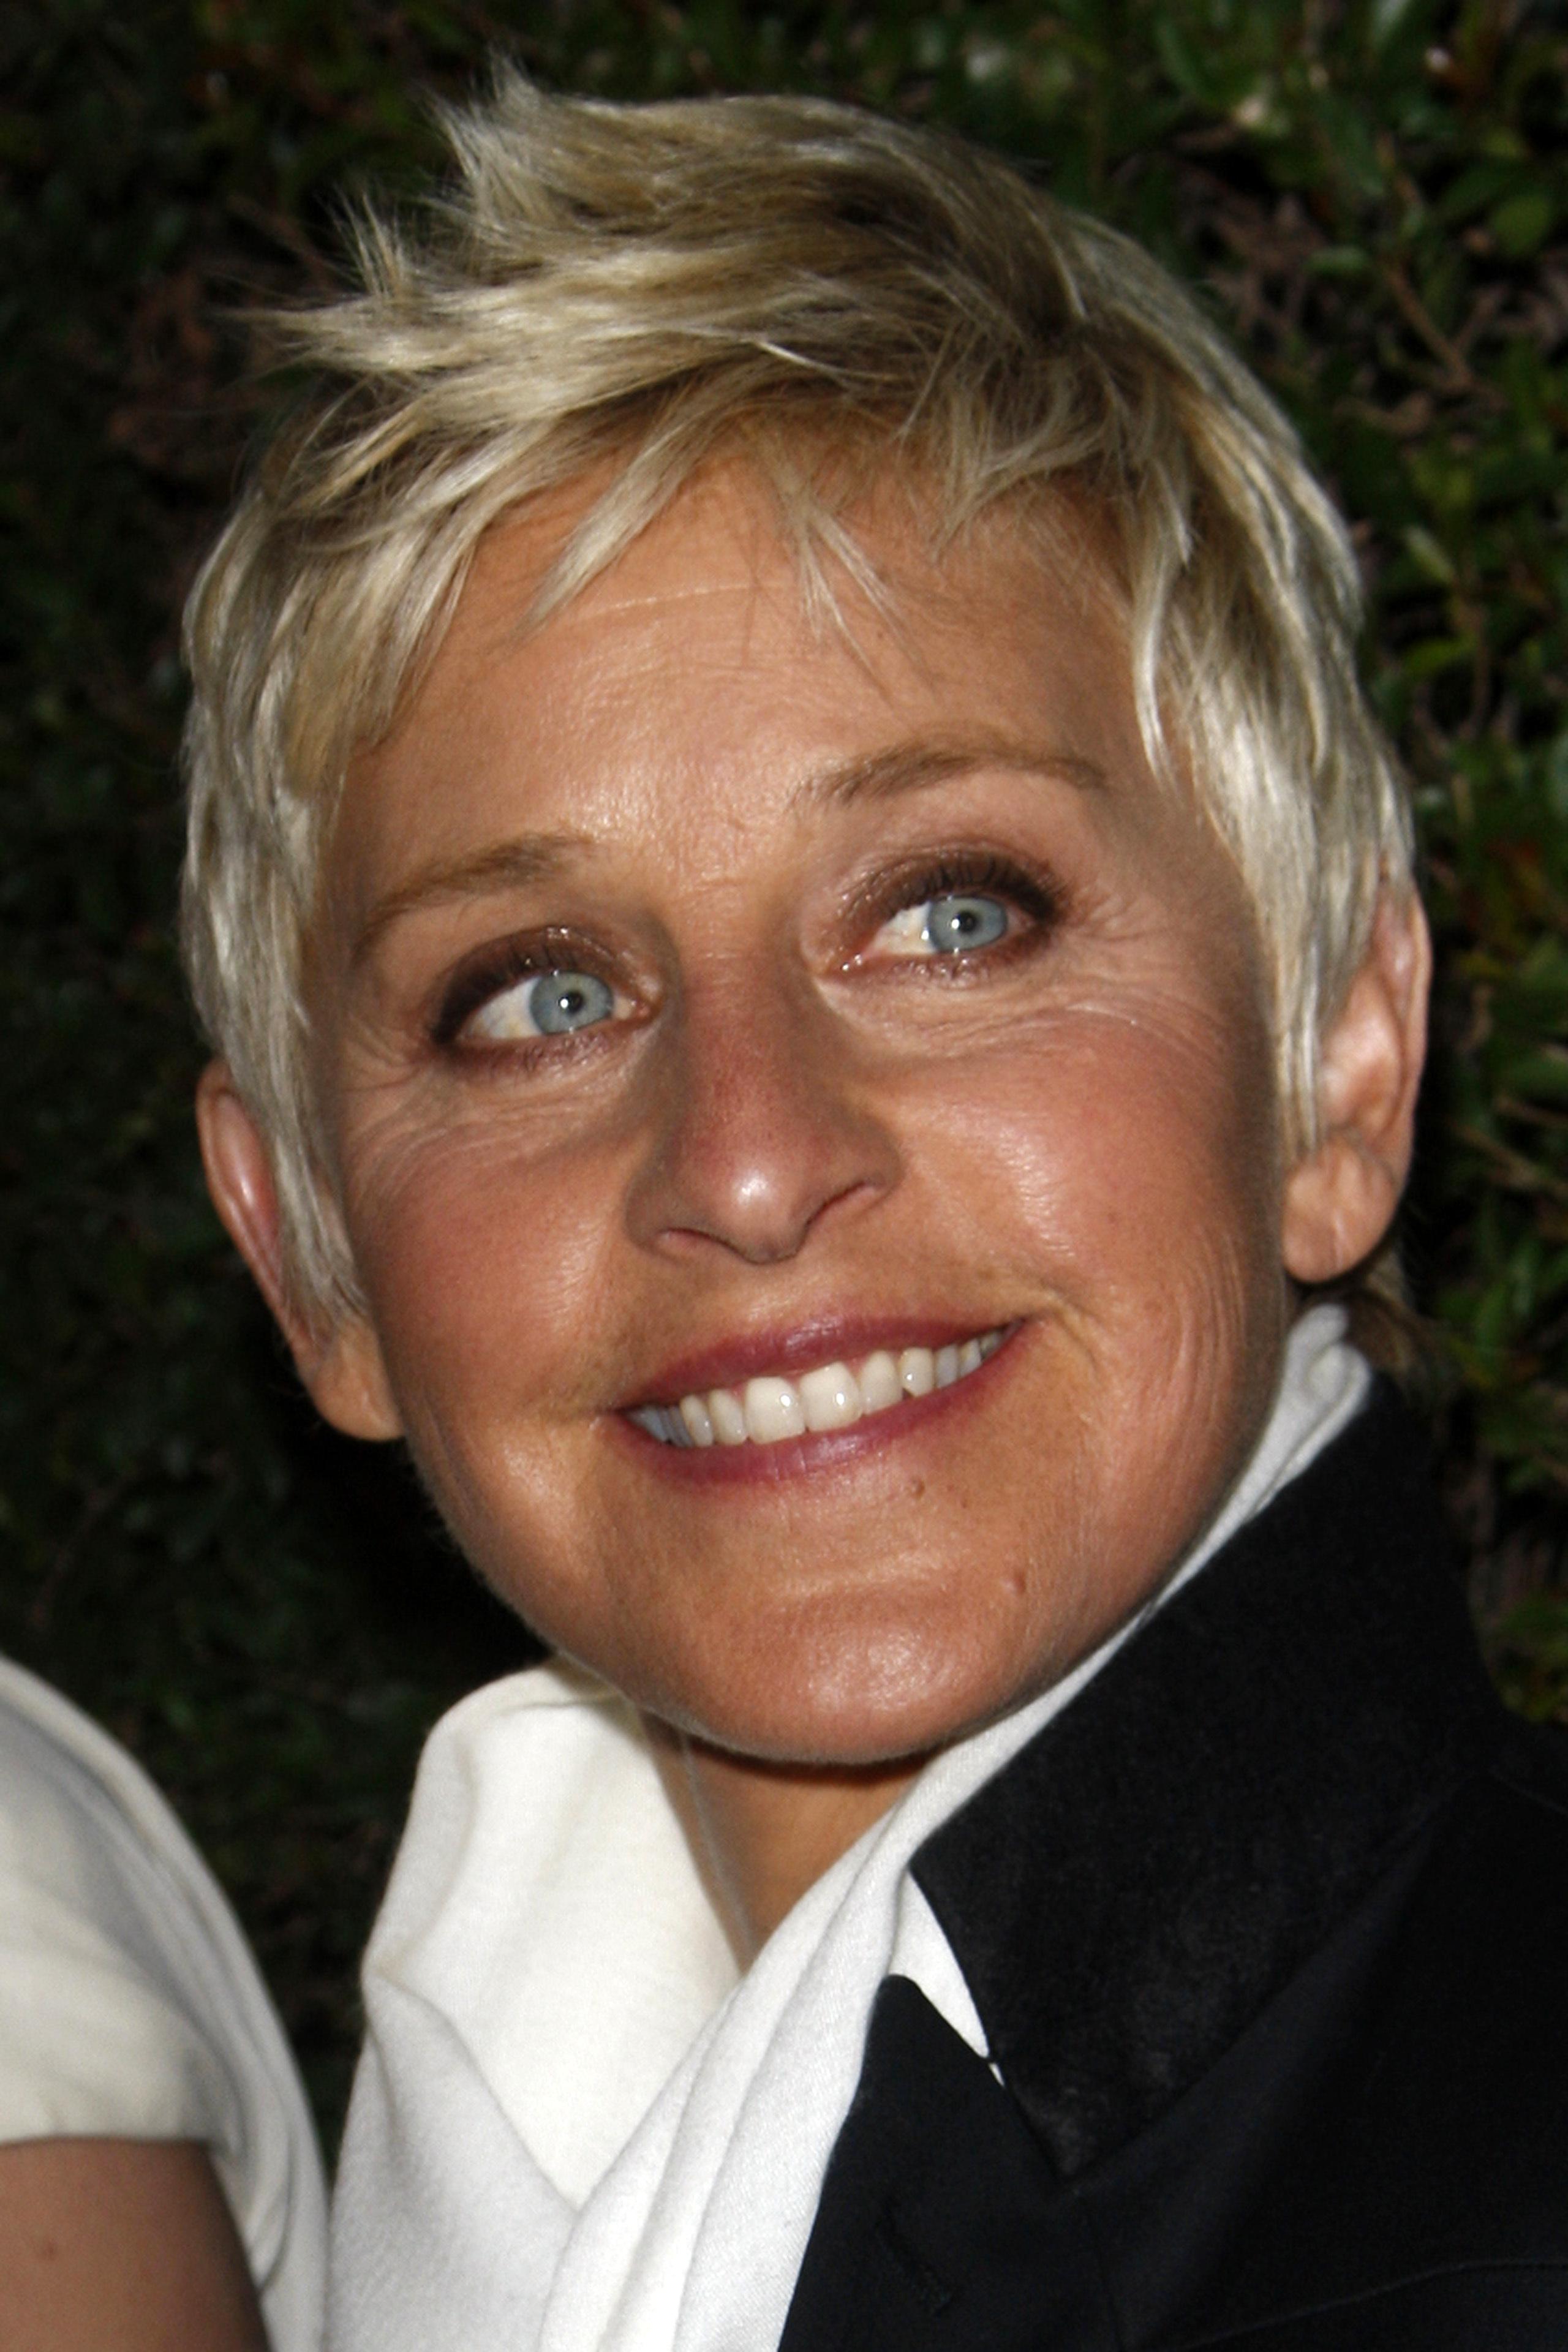 Ellen DeGeneres tearfully responds to Black Lives Matter